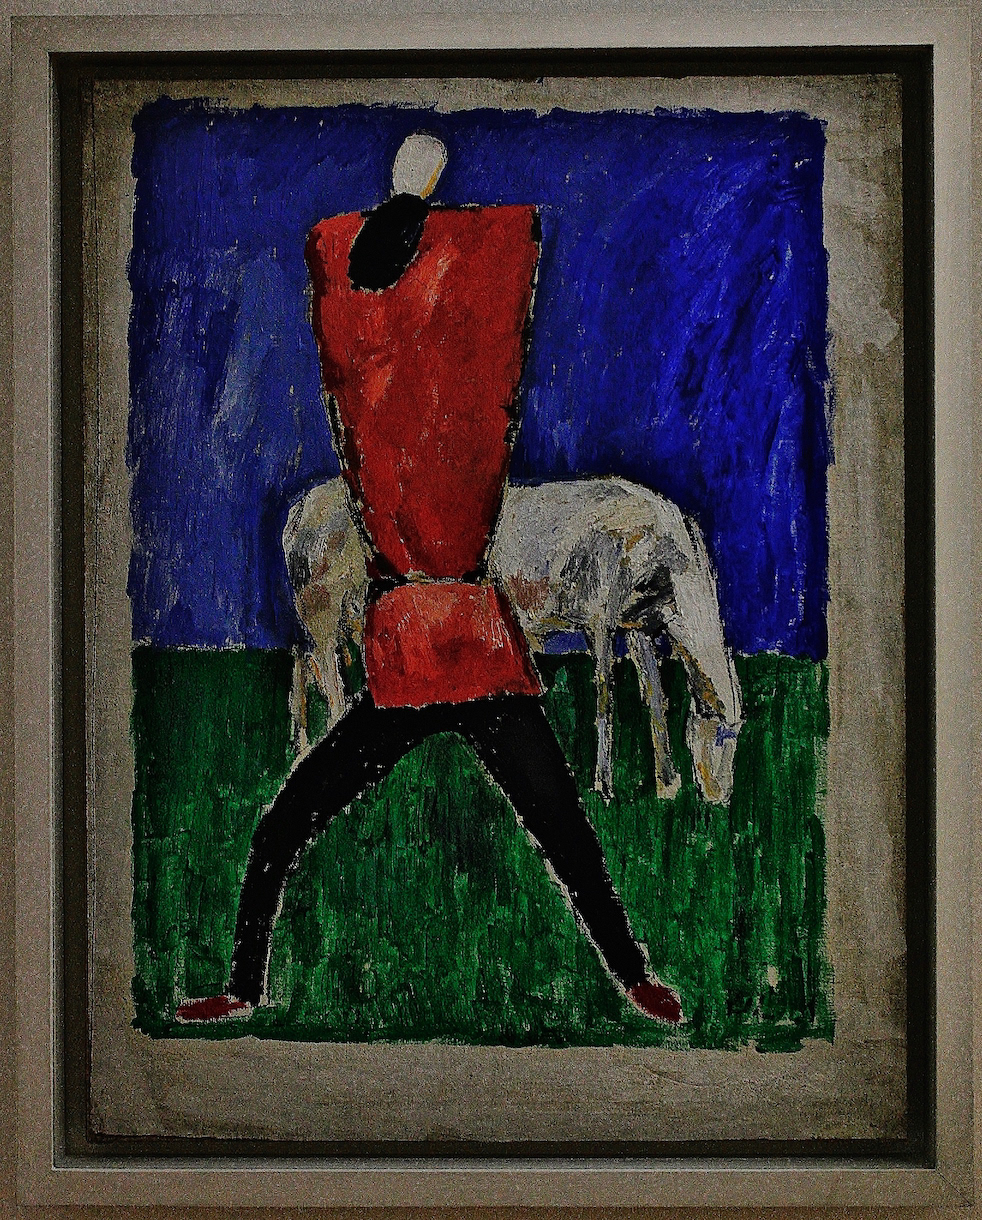 Centre Pompidou Paris Berthe Trepát duchamps artaud warhol Rogi André Ten Lizes malevitch paulo bruscky